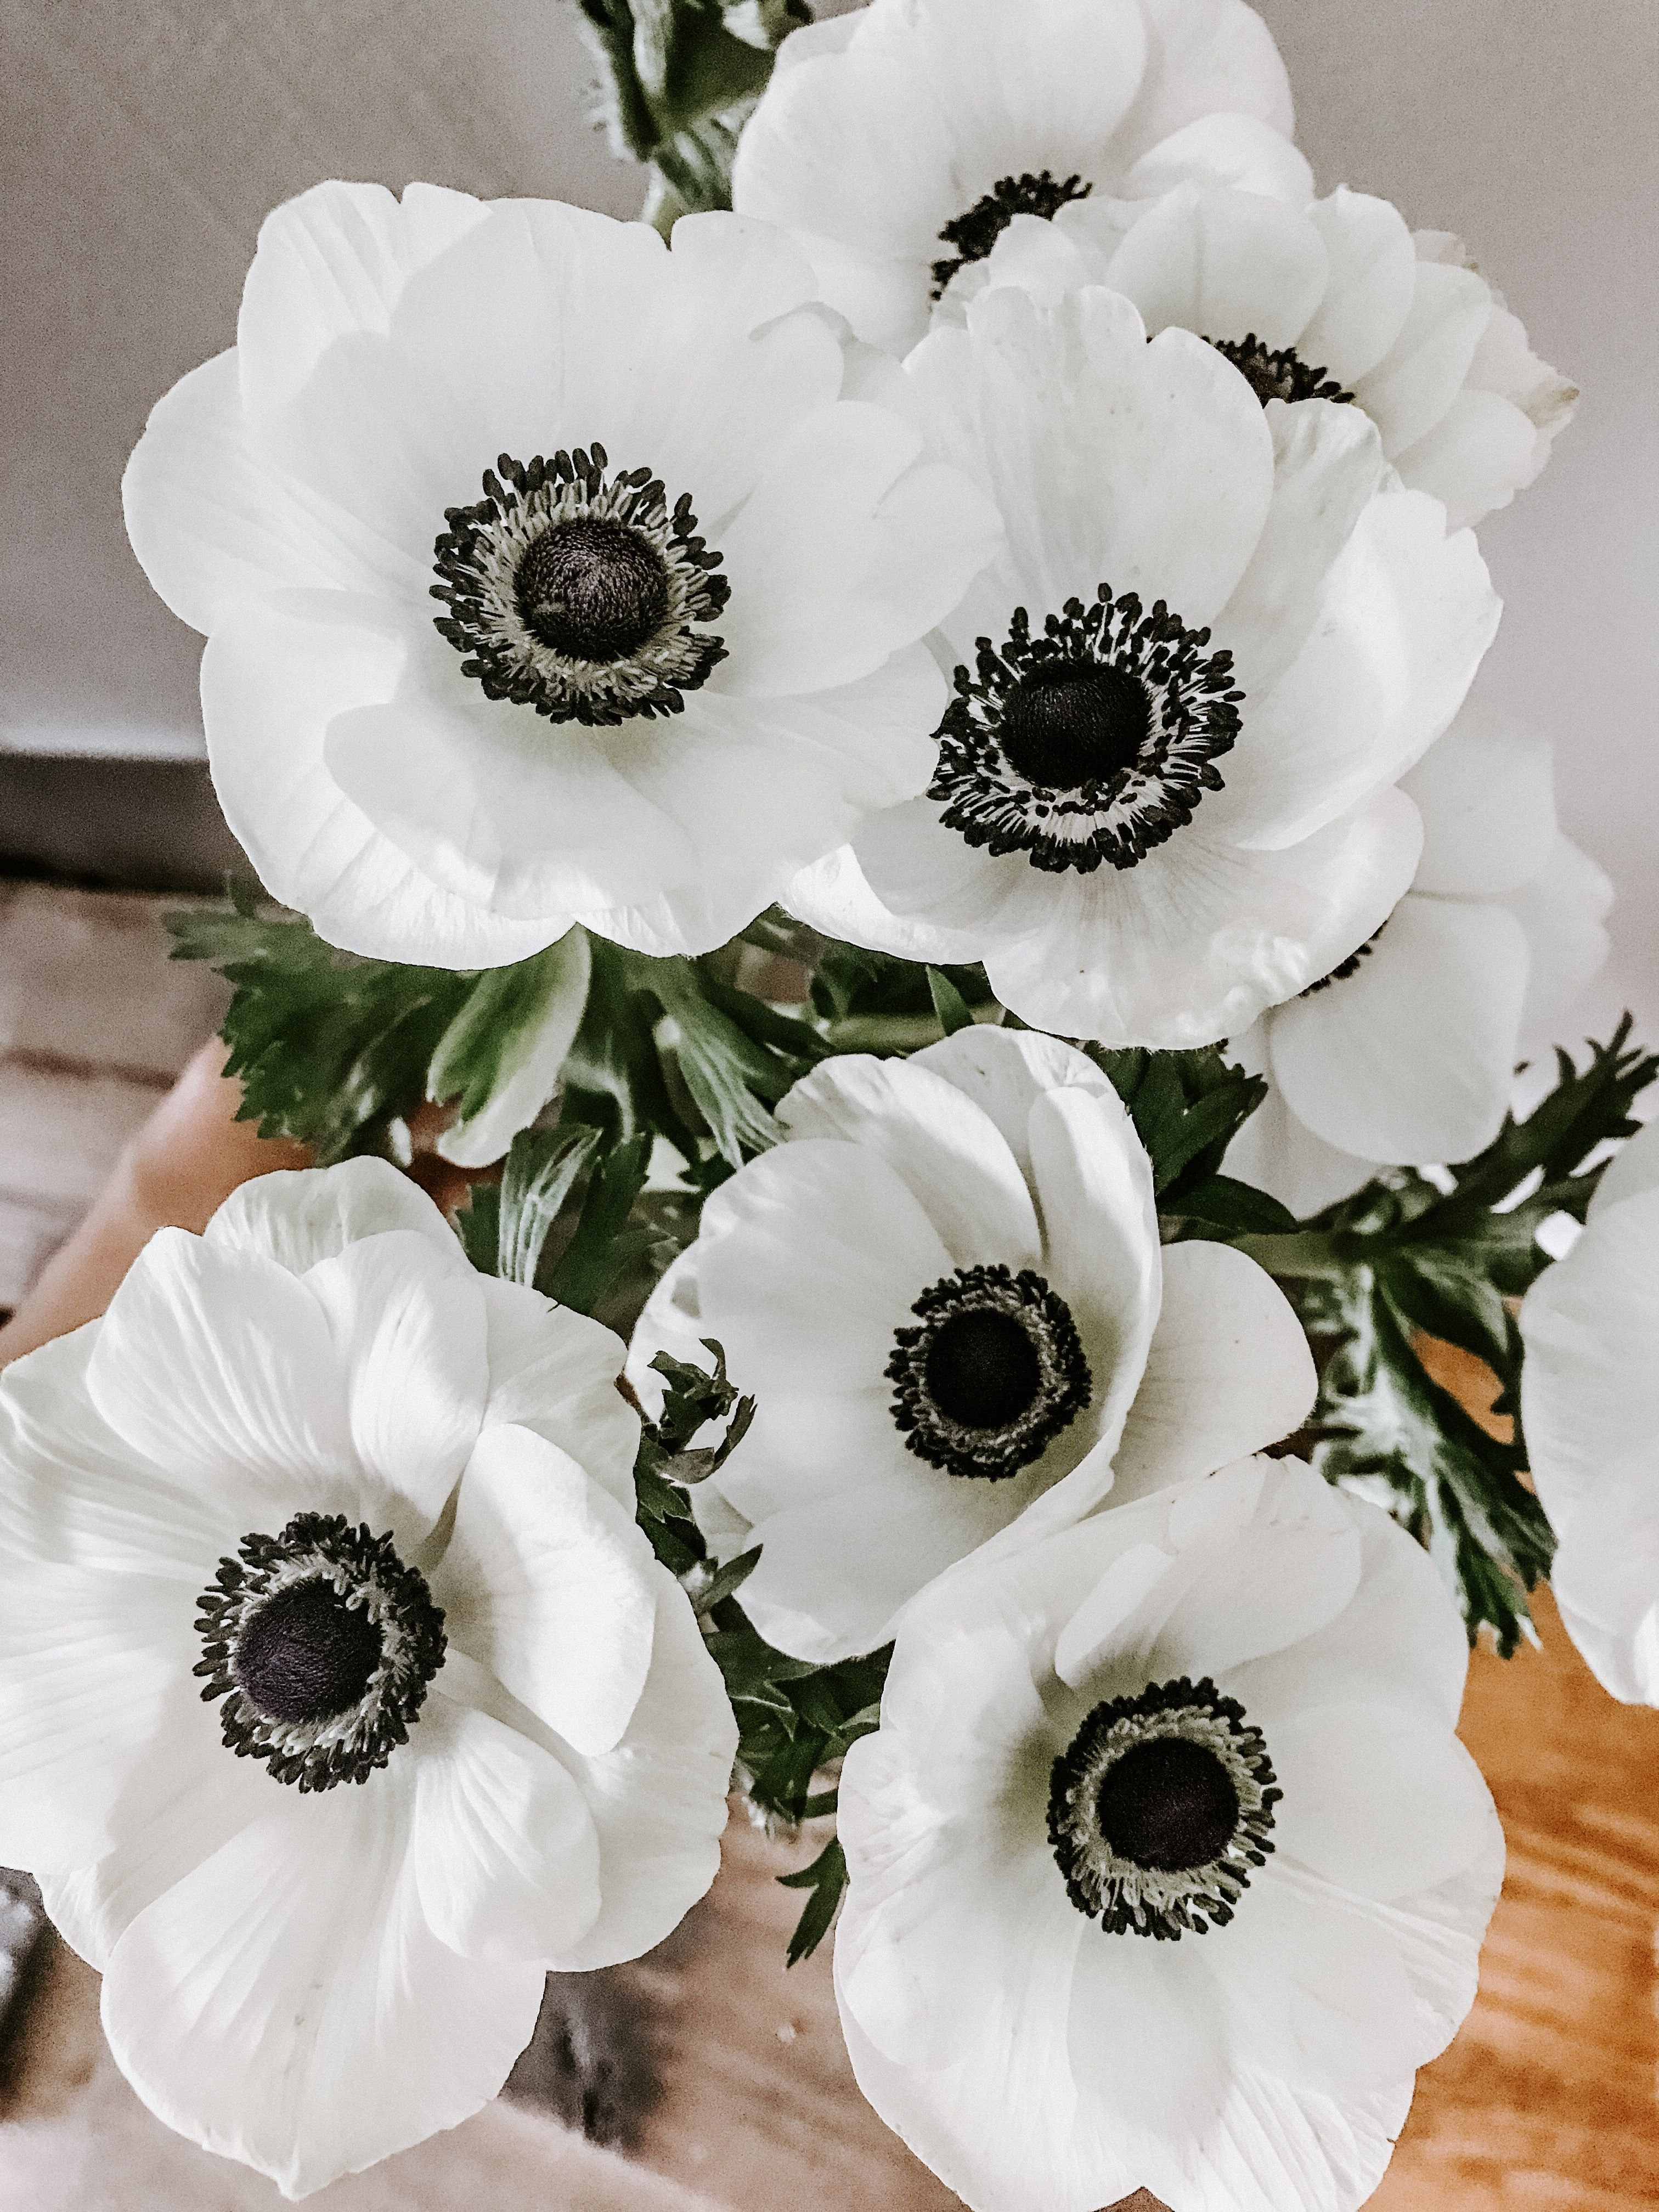 Black Eyed Anemones Anemone Flower Pretty Flowers Flower Arrangements